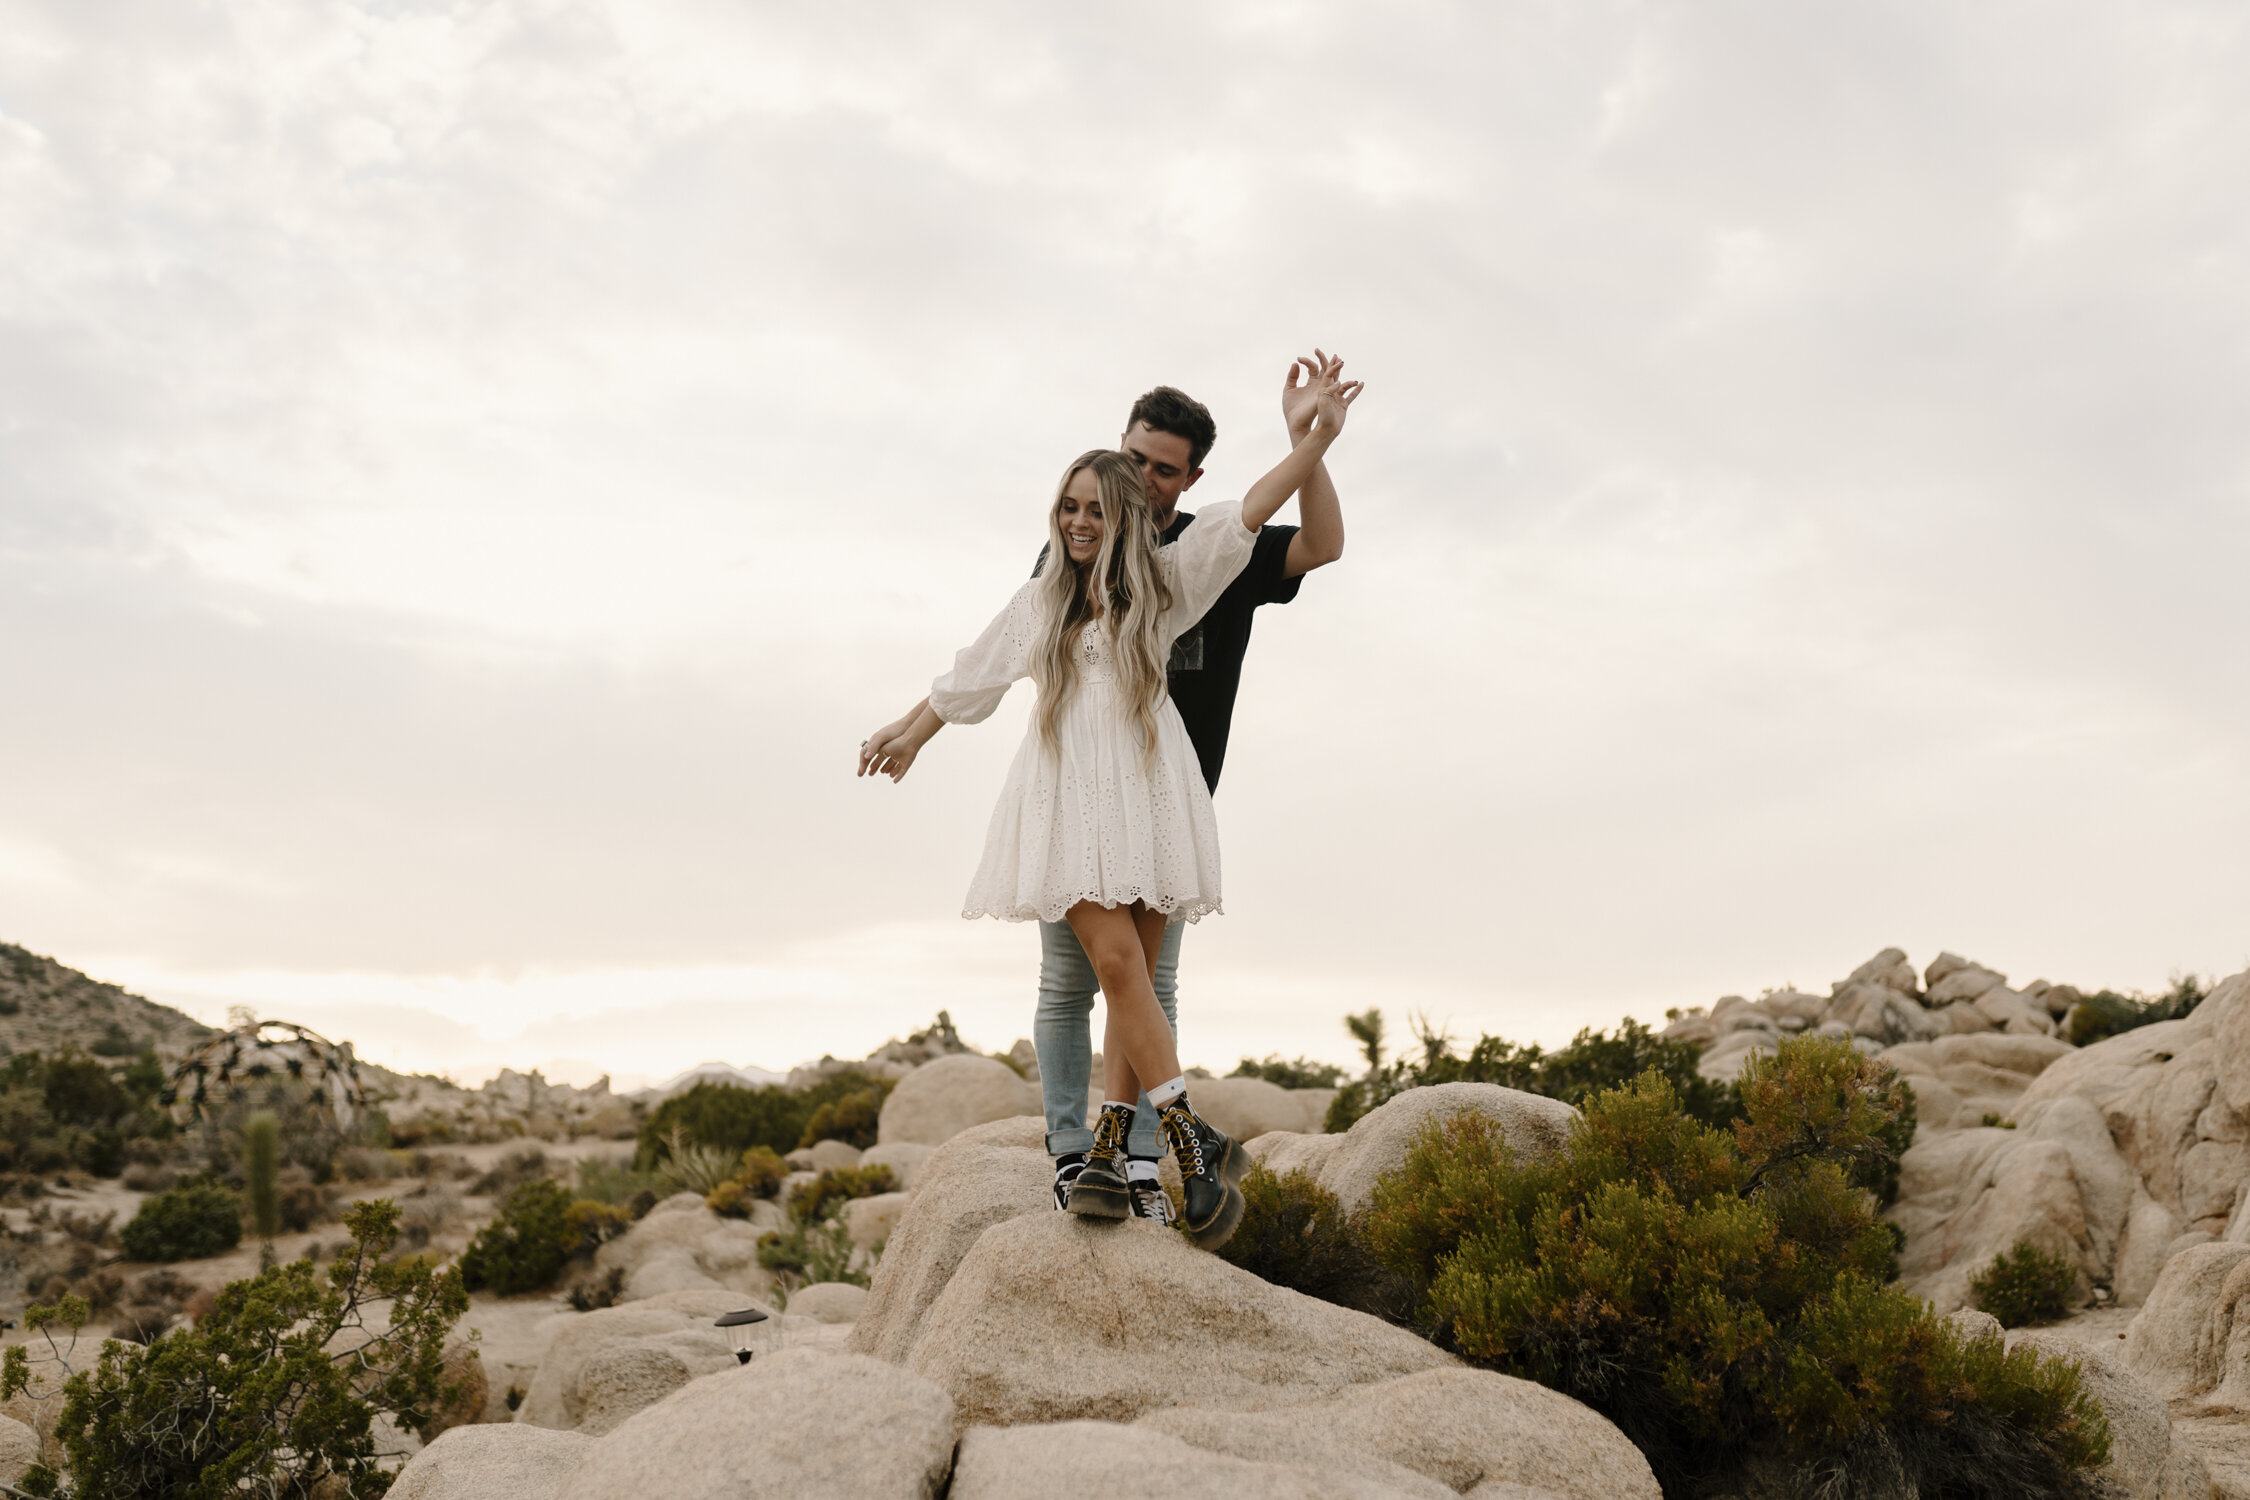 Adventurous Engagement Session in Joshua Tree by Kayli LaFon Photography